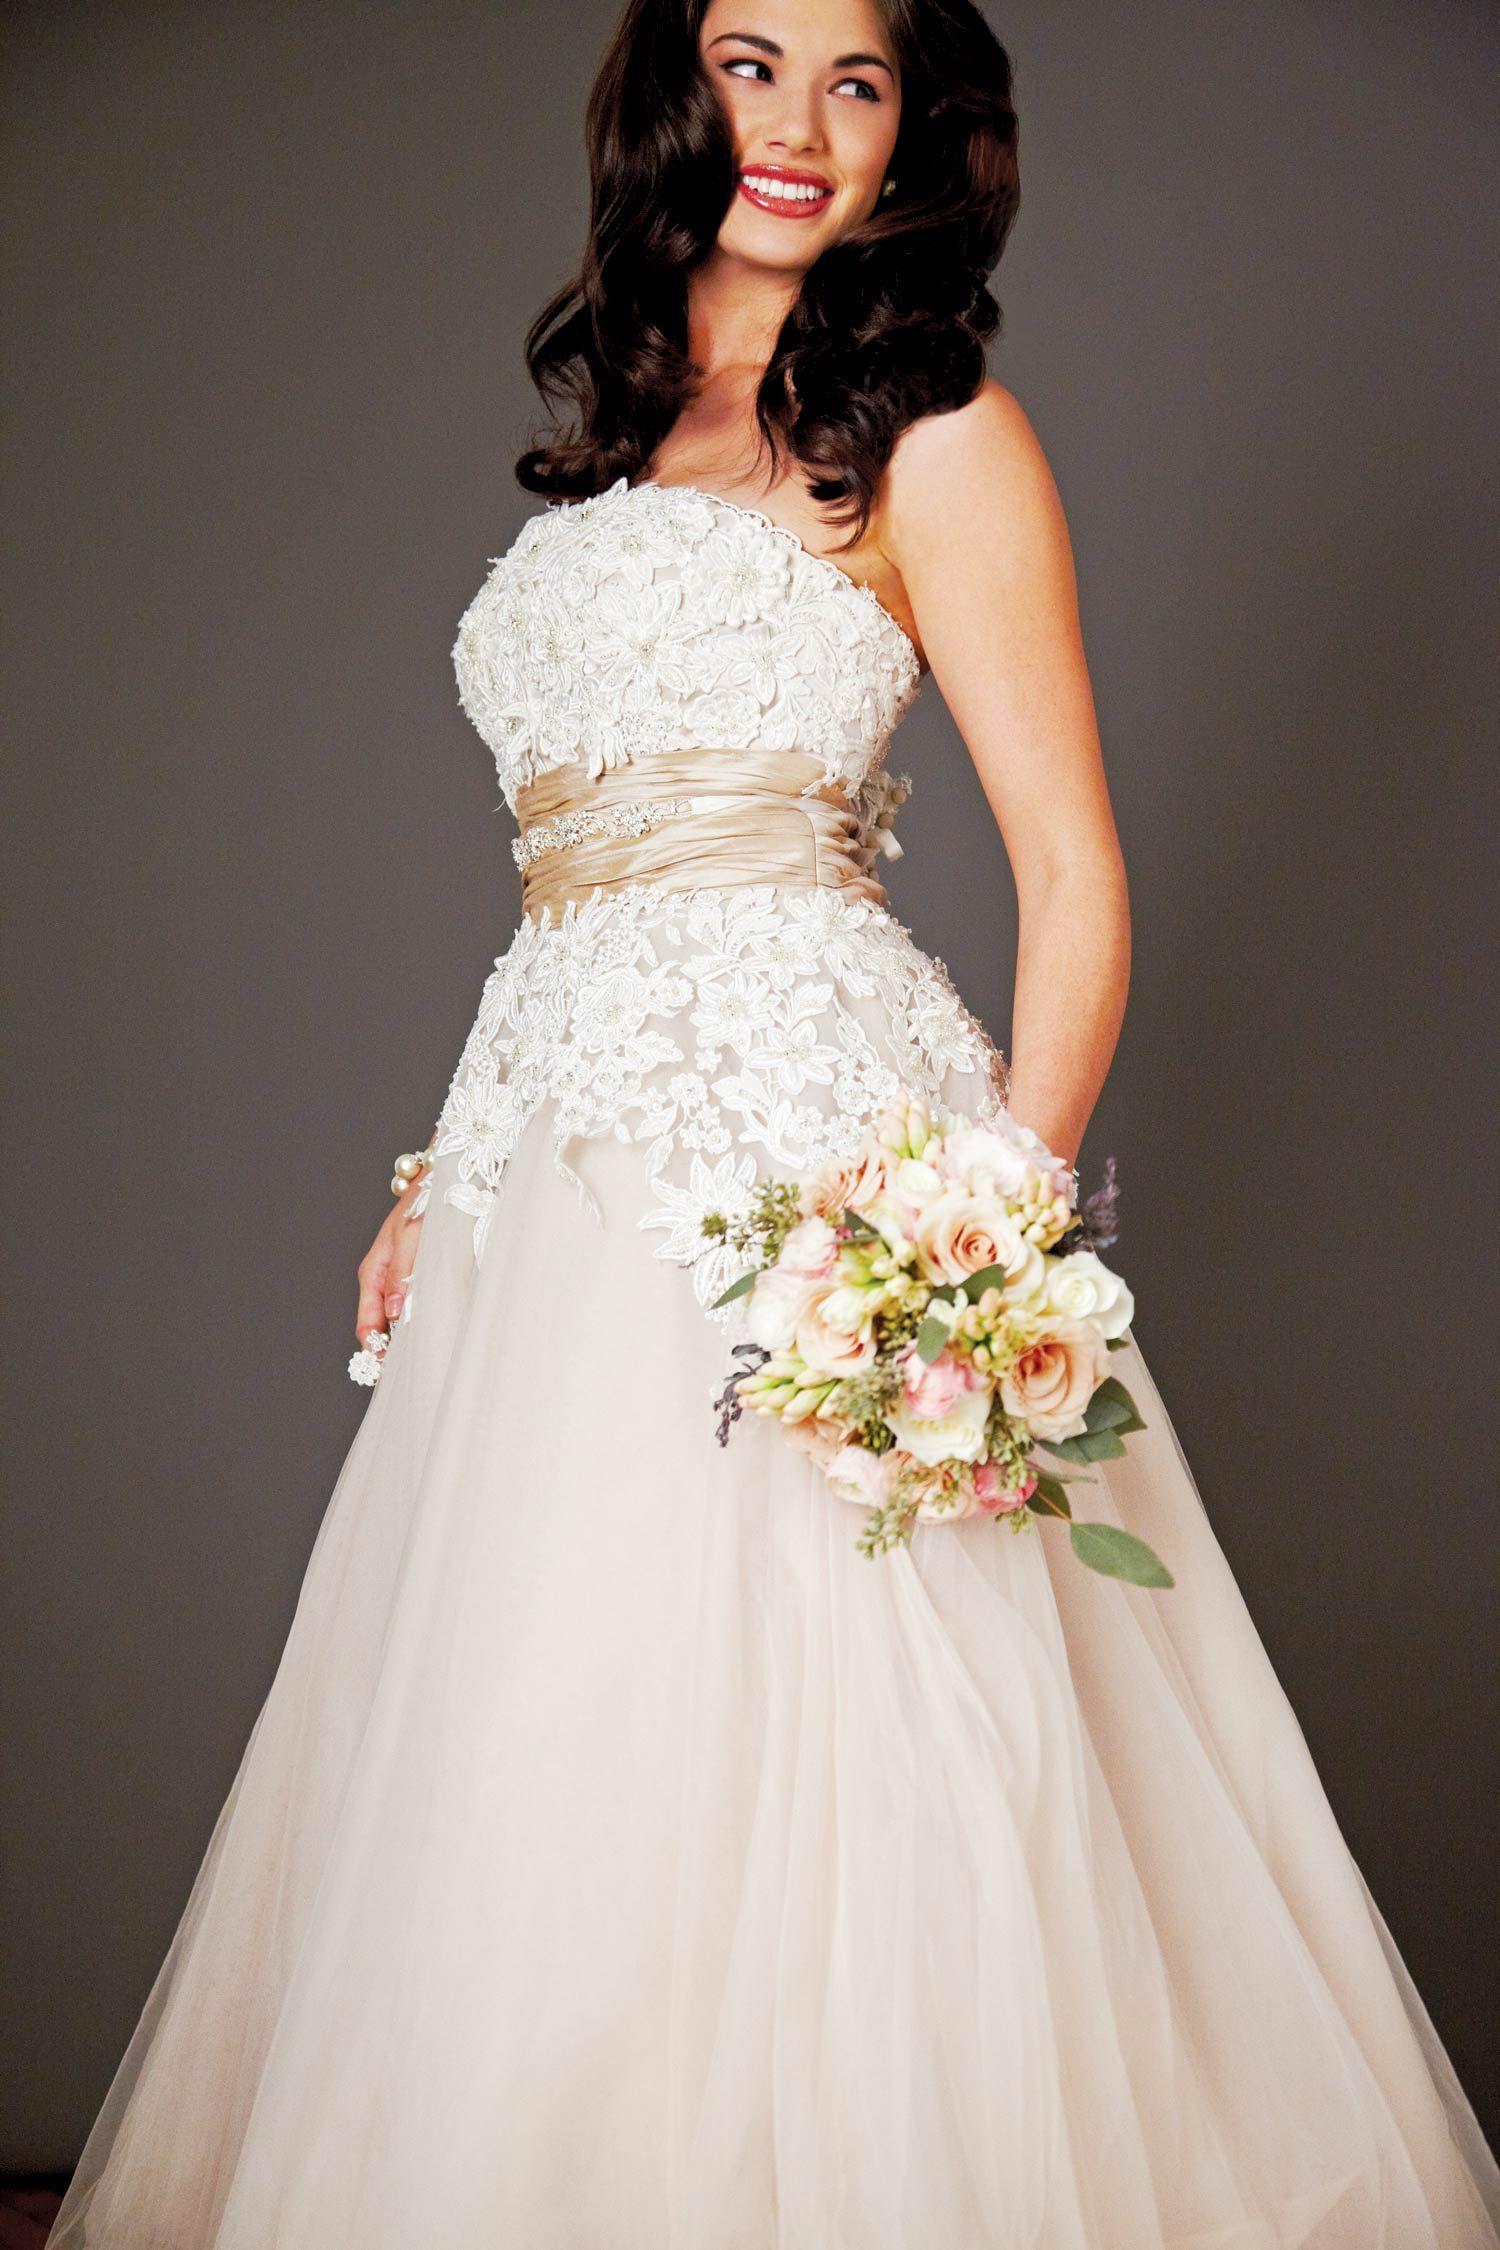 Justin alexander wedding dress bella sera bridal giselle justin alexander wedding dress bella sera bridal giselle rhinestone beltheadpiece bella junglespirit Gallery